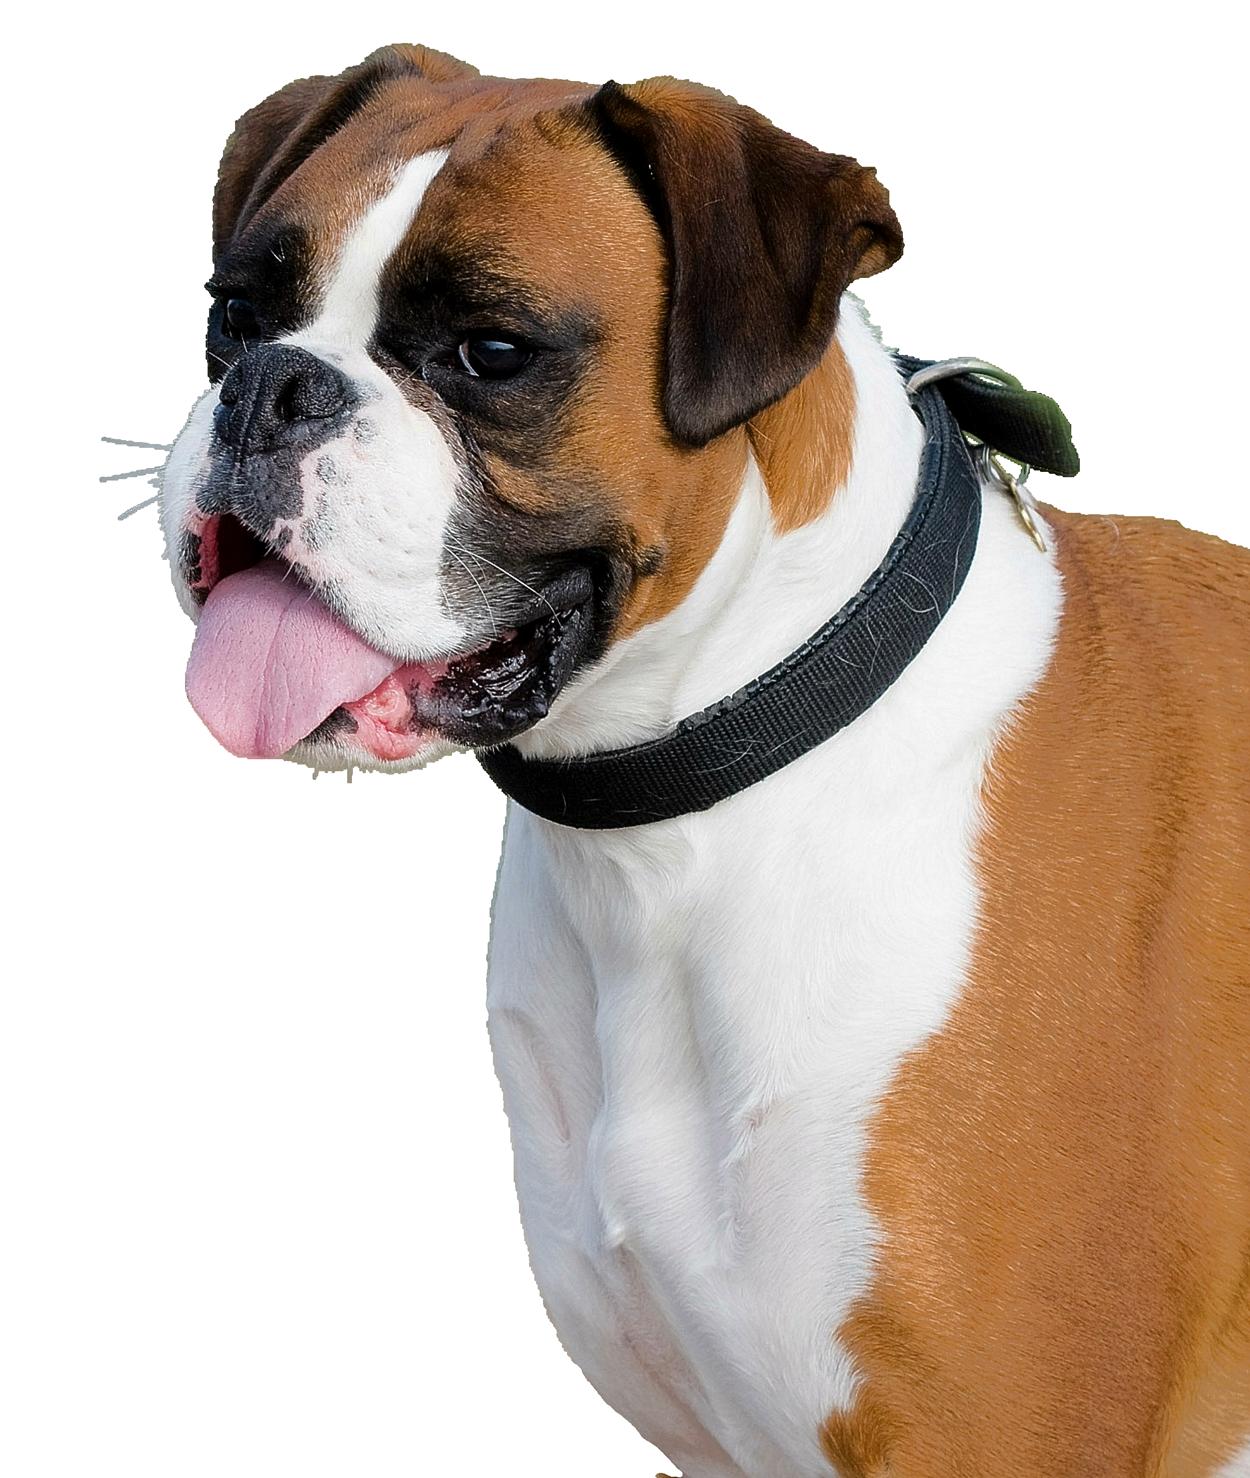 Boxer Dog PNG Image - PurePNG | Free transparent CC0 PNG ...